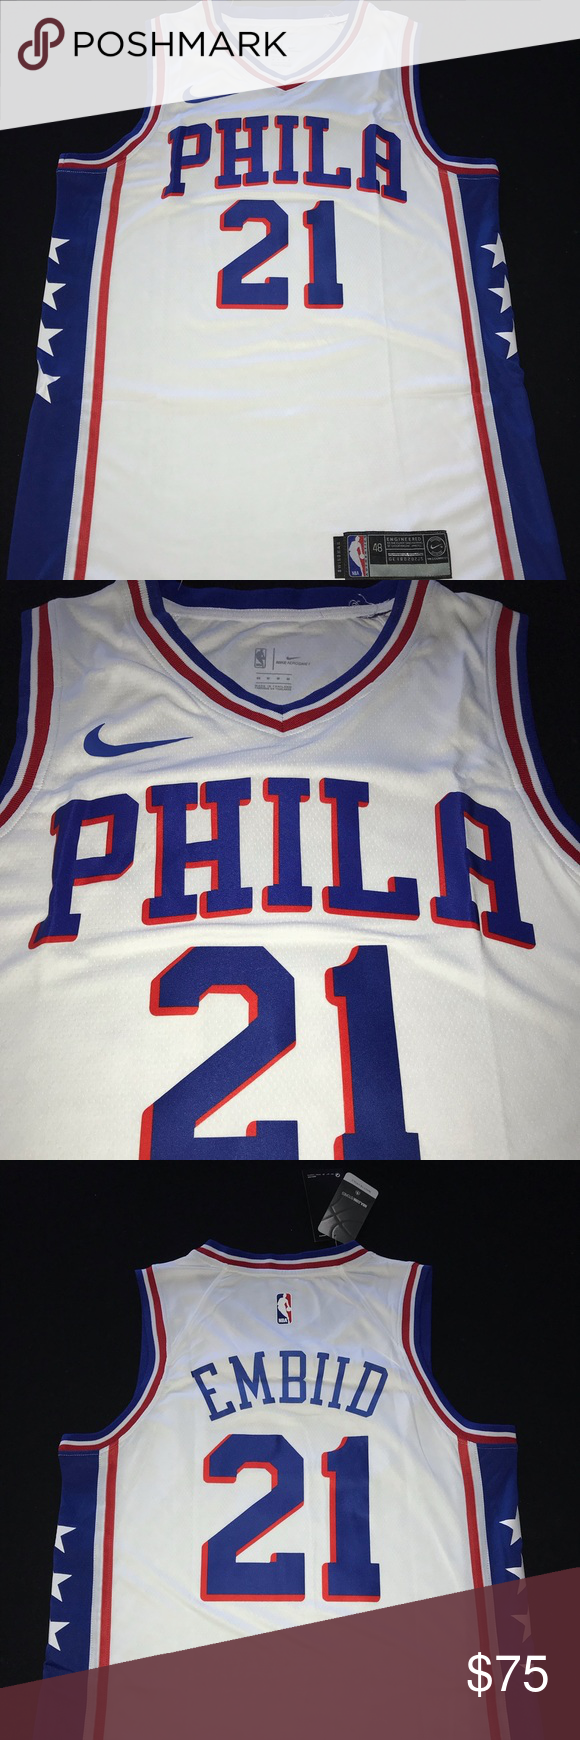 Joel Embiid Philadelphia 76ers Jersey Brand New With Tags Nike Shirts Tank Tops Jersey Nike Shirts Tank Top Shirt